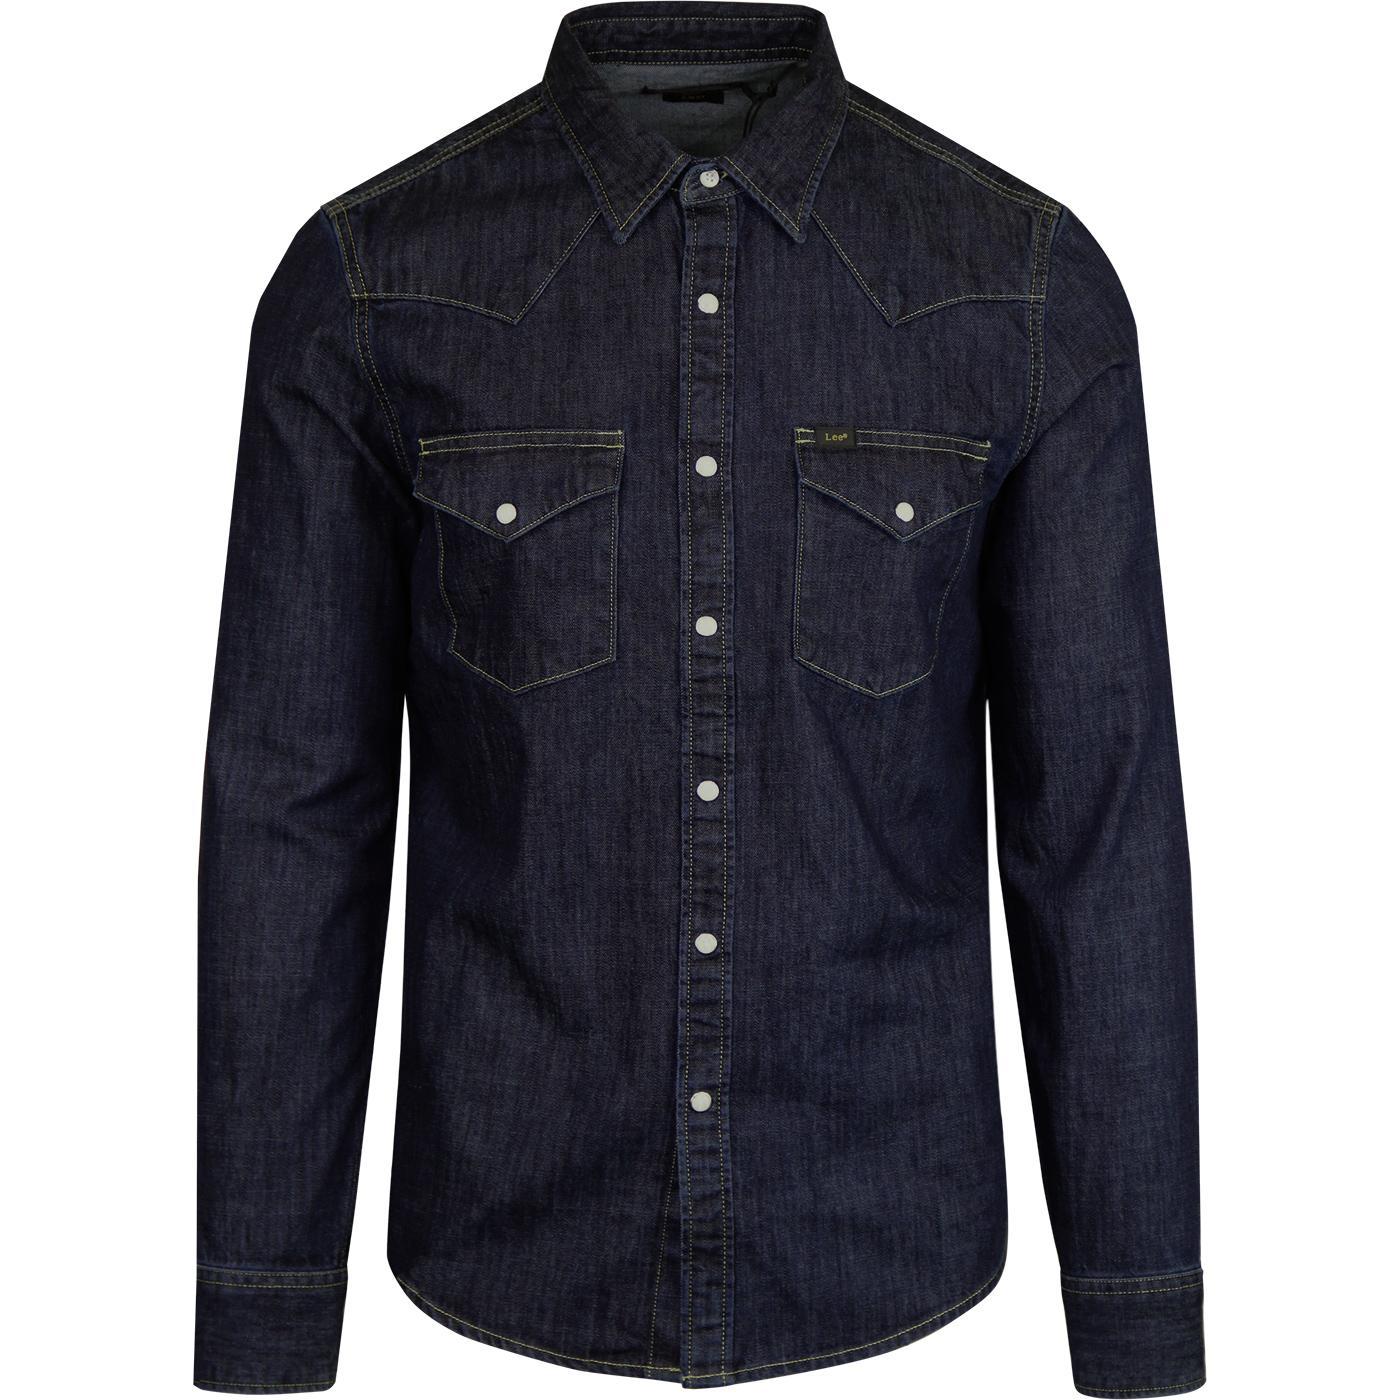 78d51950453 LEE Men's Retro 1970s Mod Denim Western Shirt in Blueprint